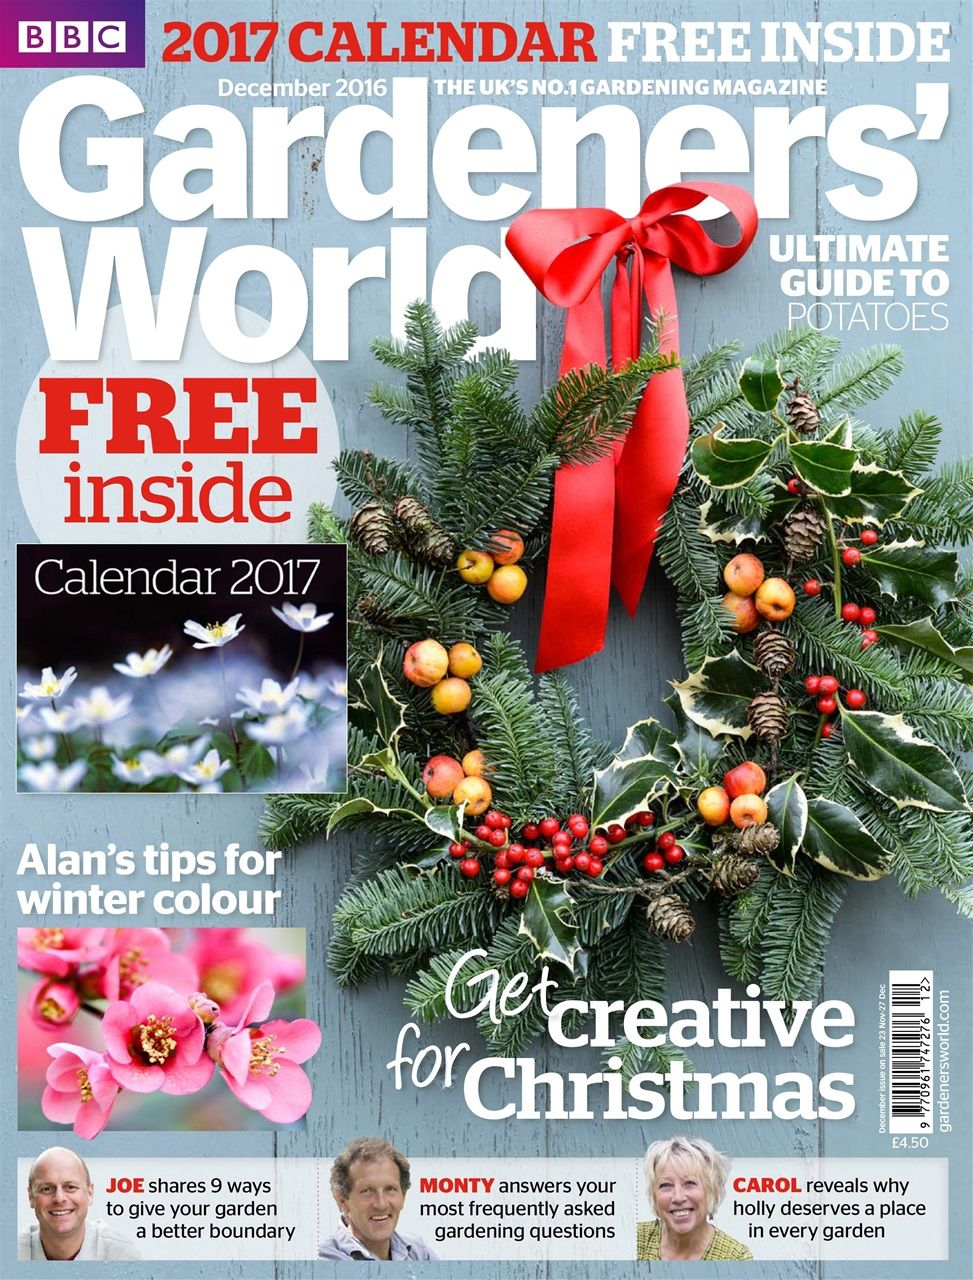 4a002042127a9ef4ec4cb6dc05630cb9 - Back Issues Of Gardeners World Magazine